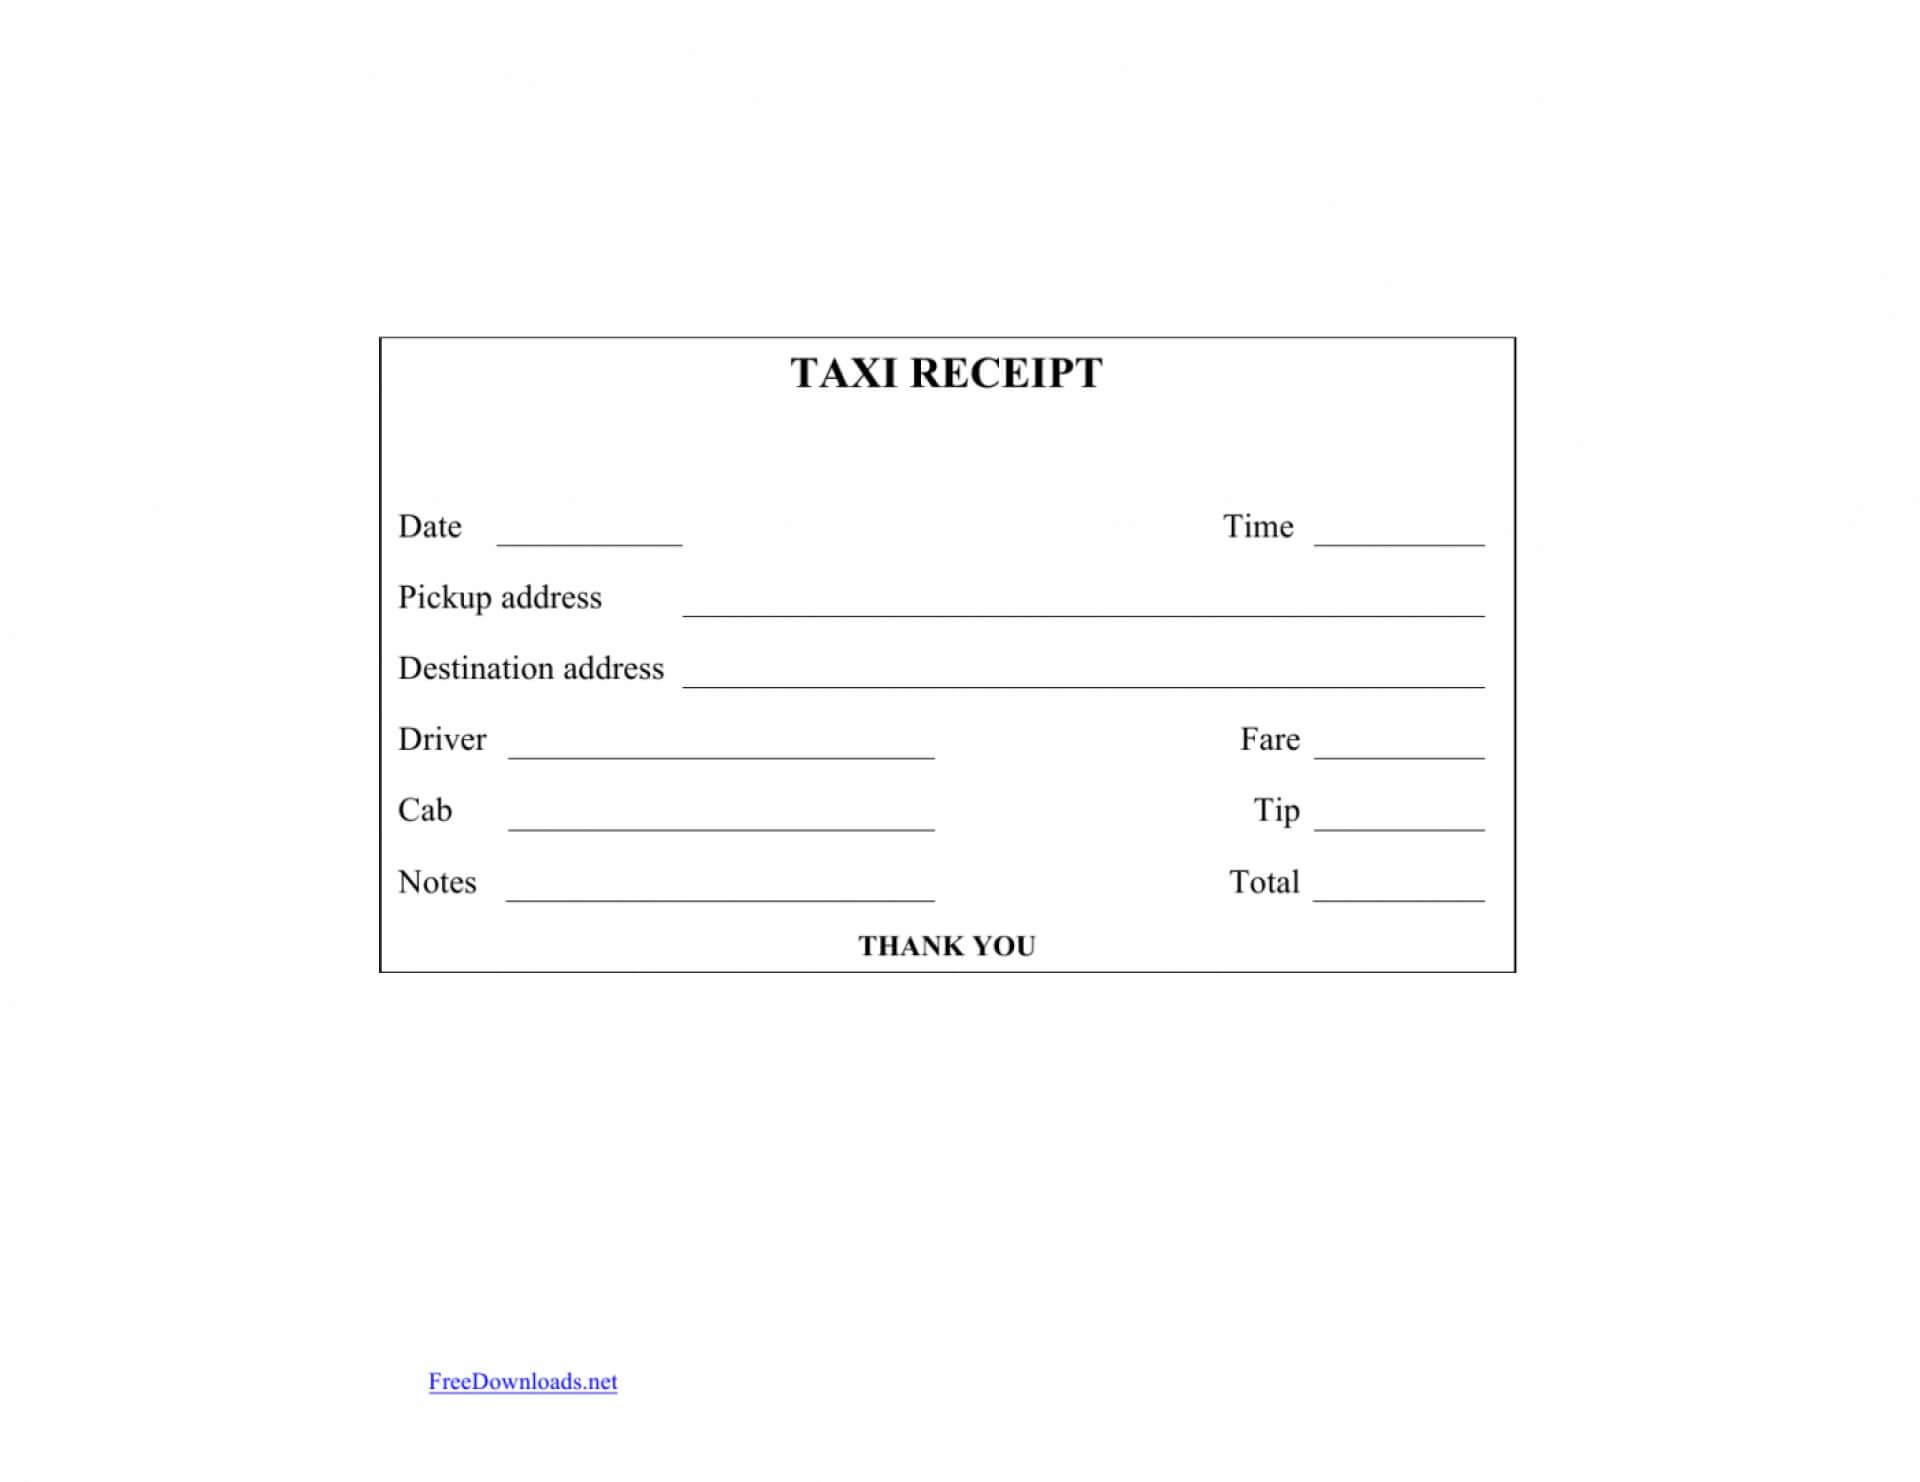 036 Blank Receipt Template Pdf Printablek Forms Sheets Cash Within Blank Taxi Receipt Template